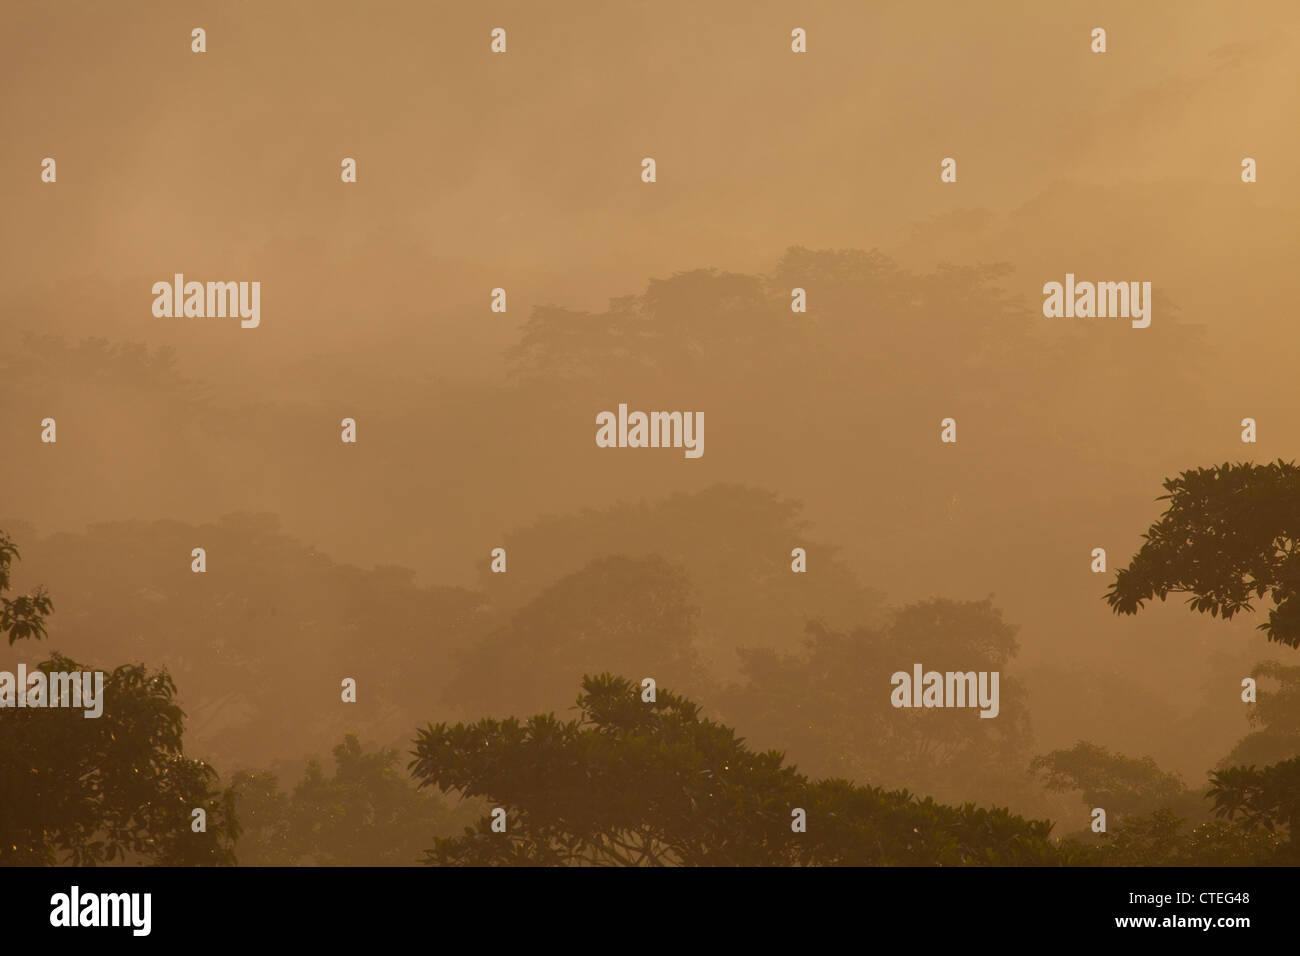 Mist at sunrise in Soberania national park, Republic of Panama. - Stock Image